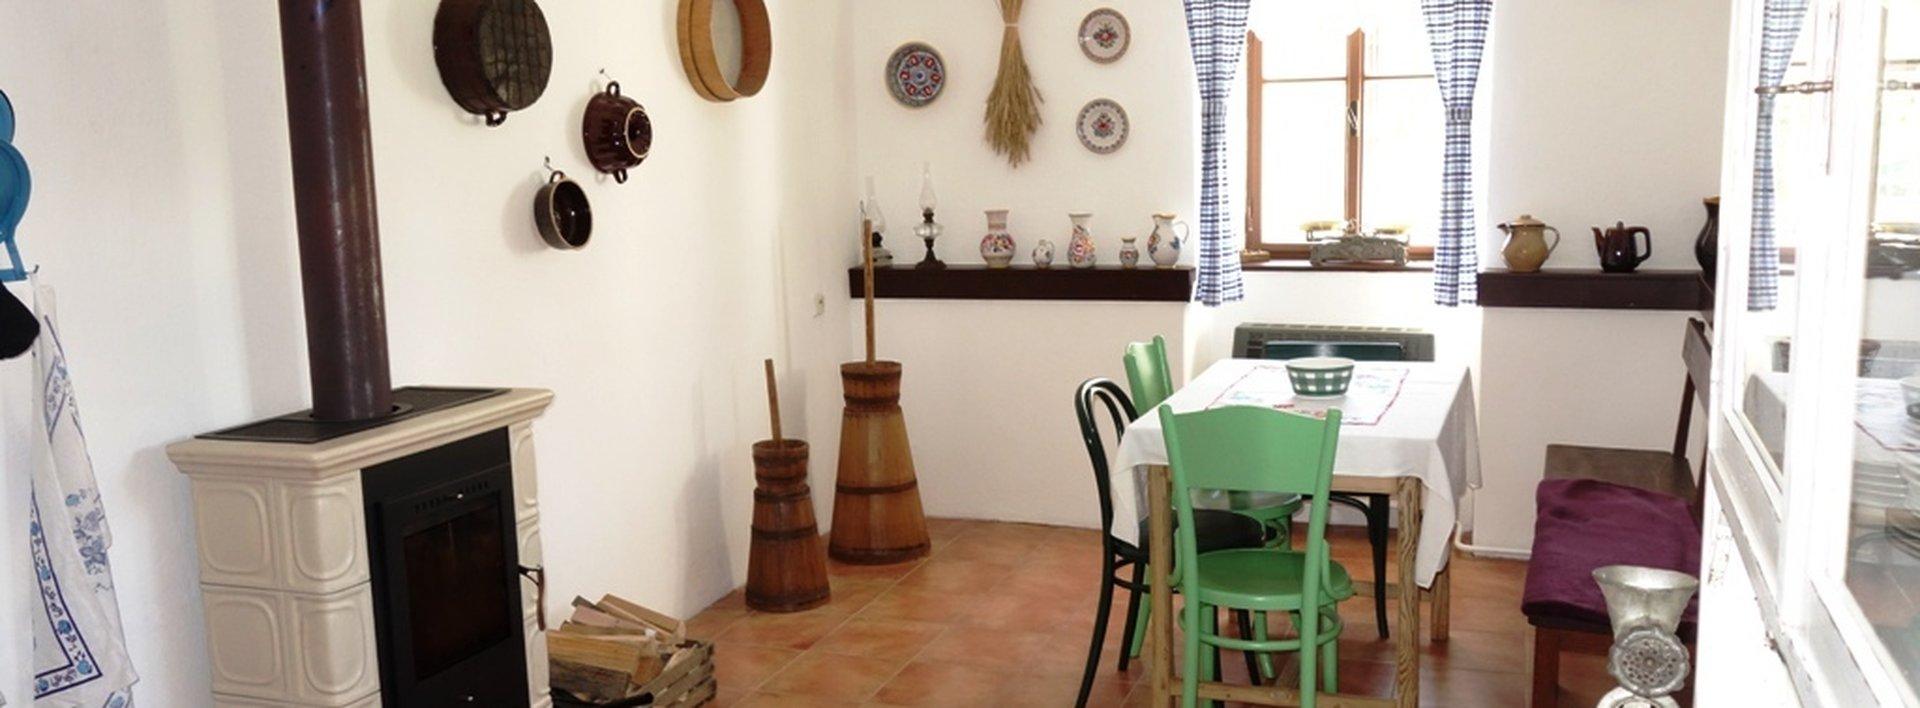 Rodinný dům (chalupa) v klidné části Nasavrk, 799 m², Ev.č.: N47732